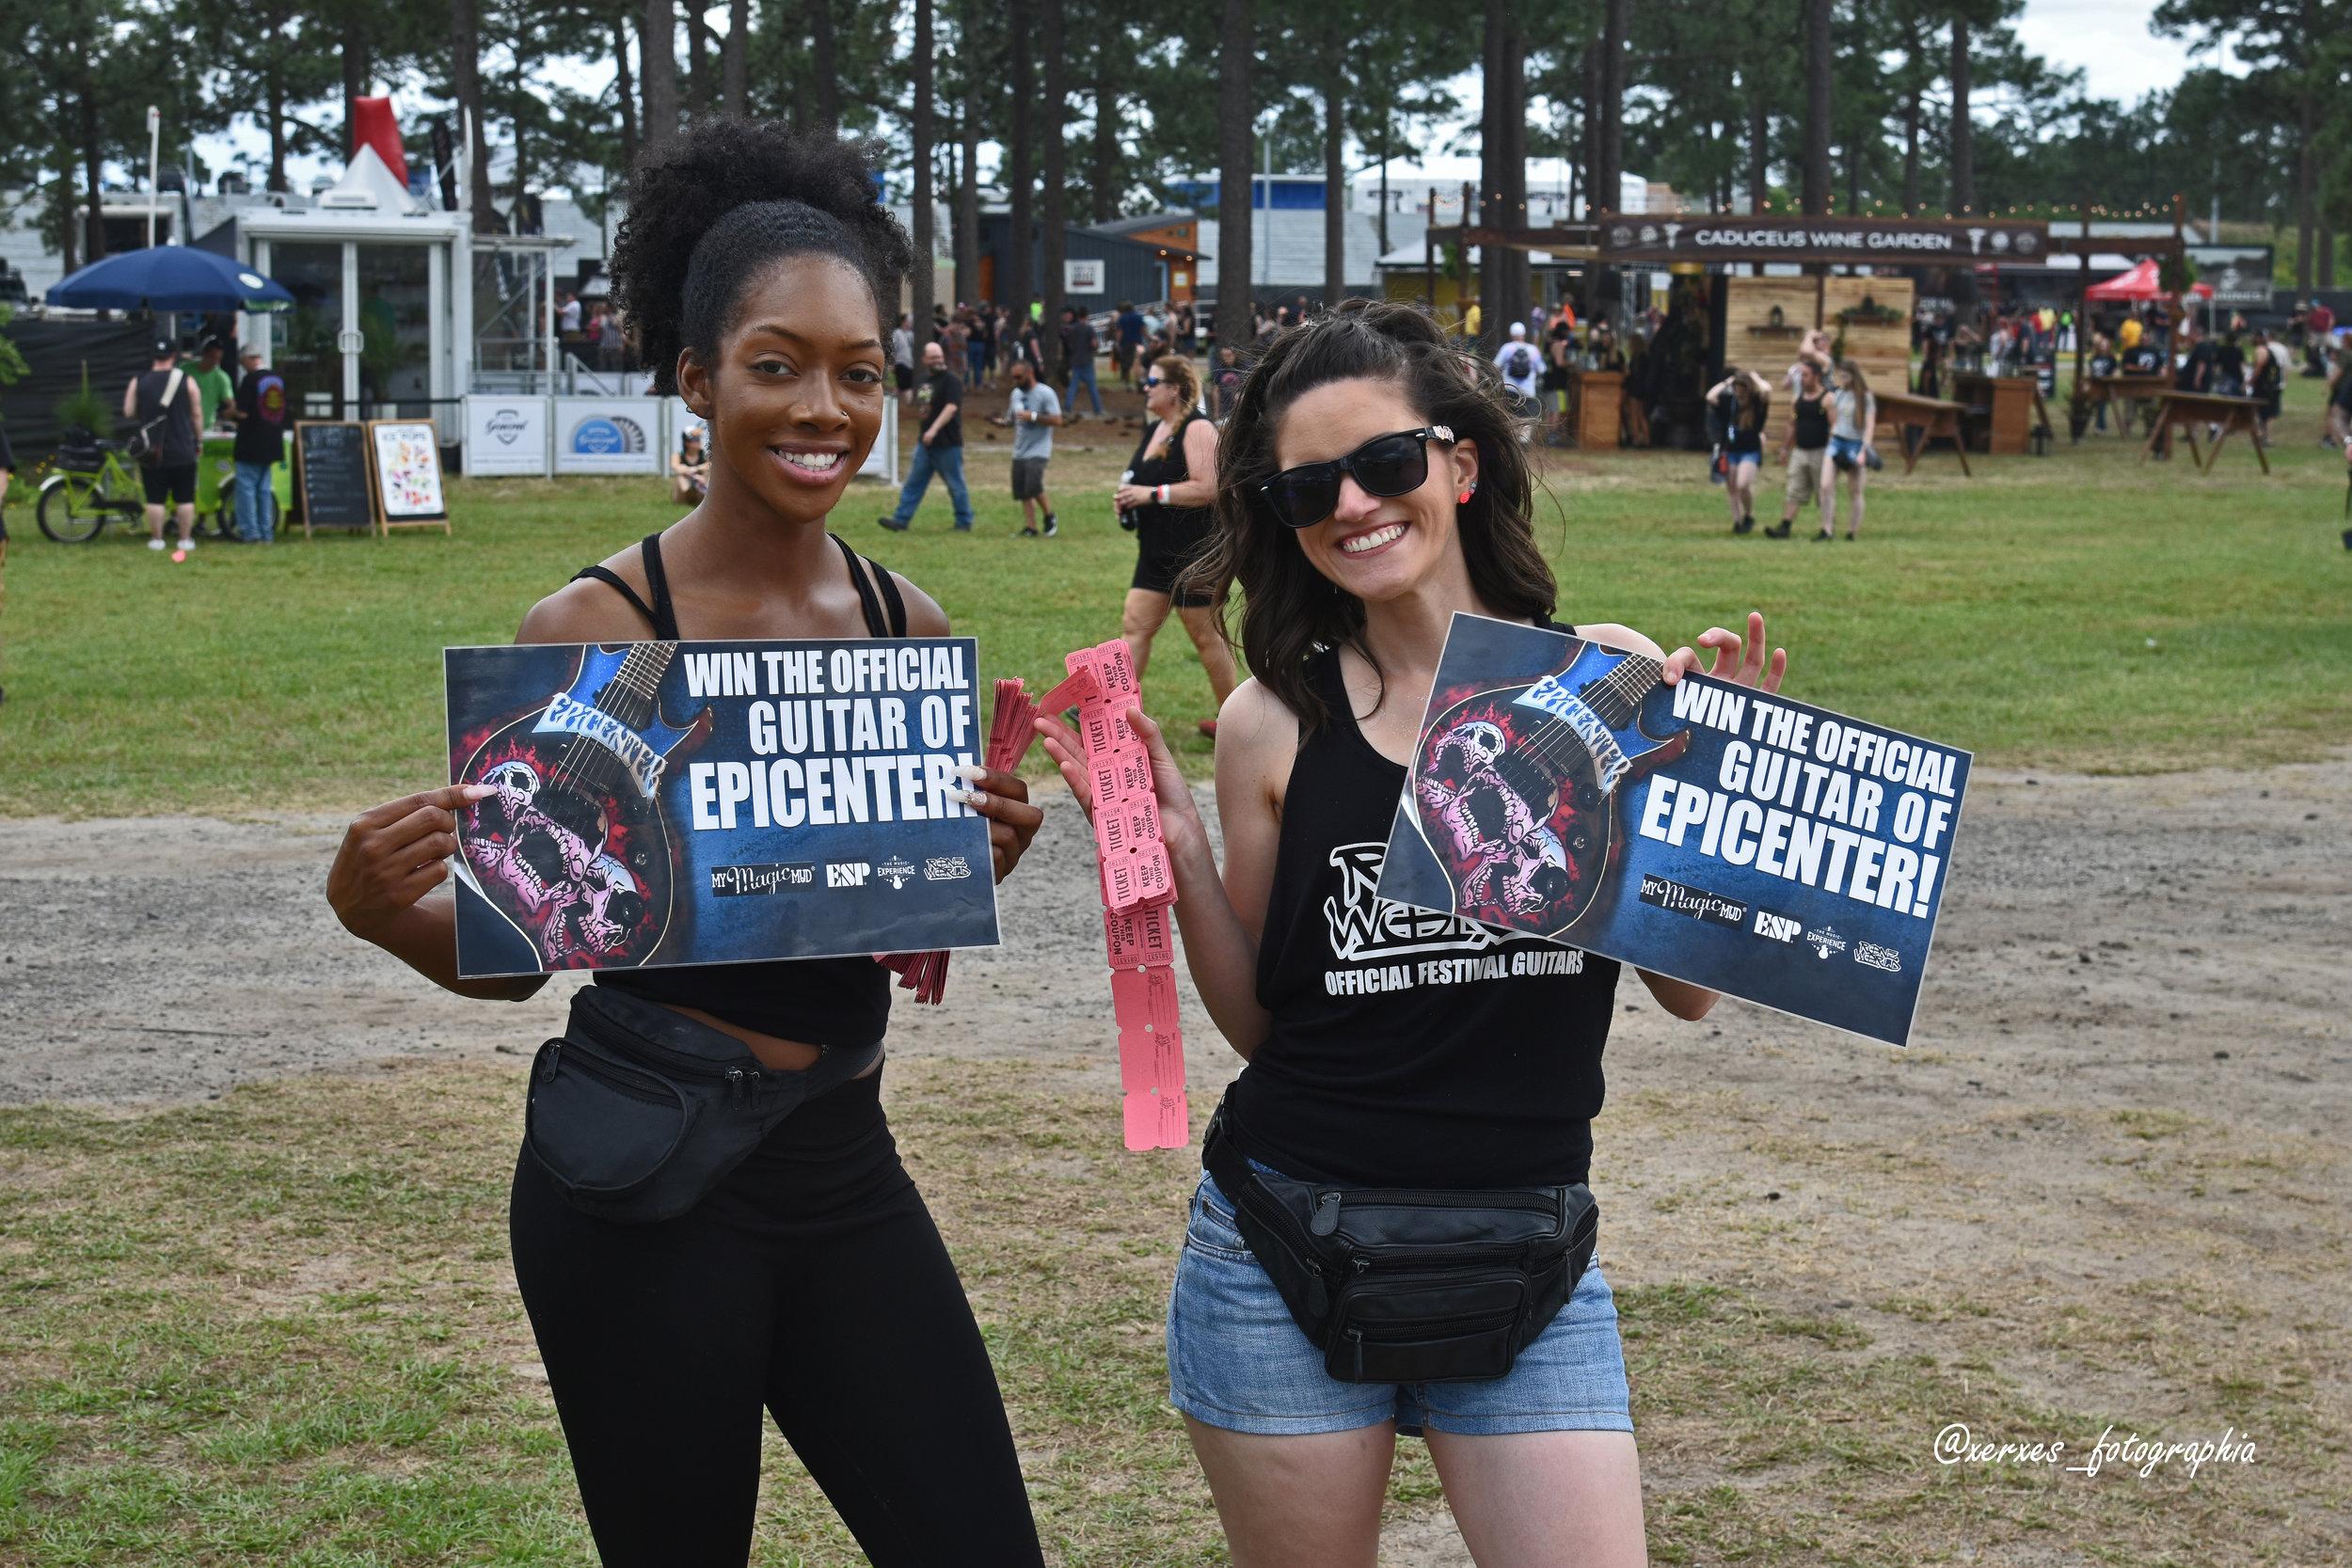 Epicenter Music Festival (Day 1)